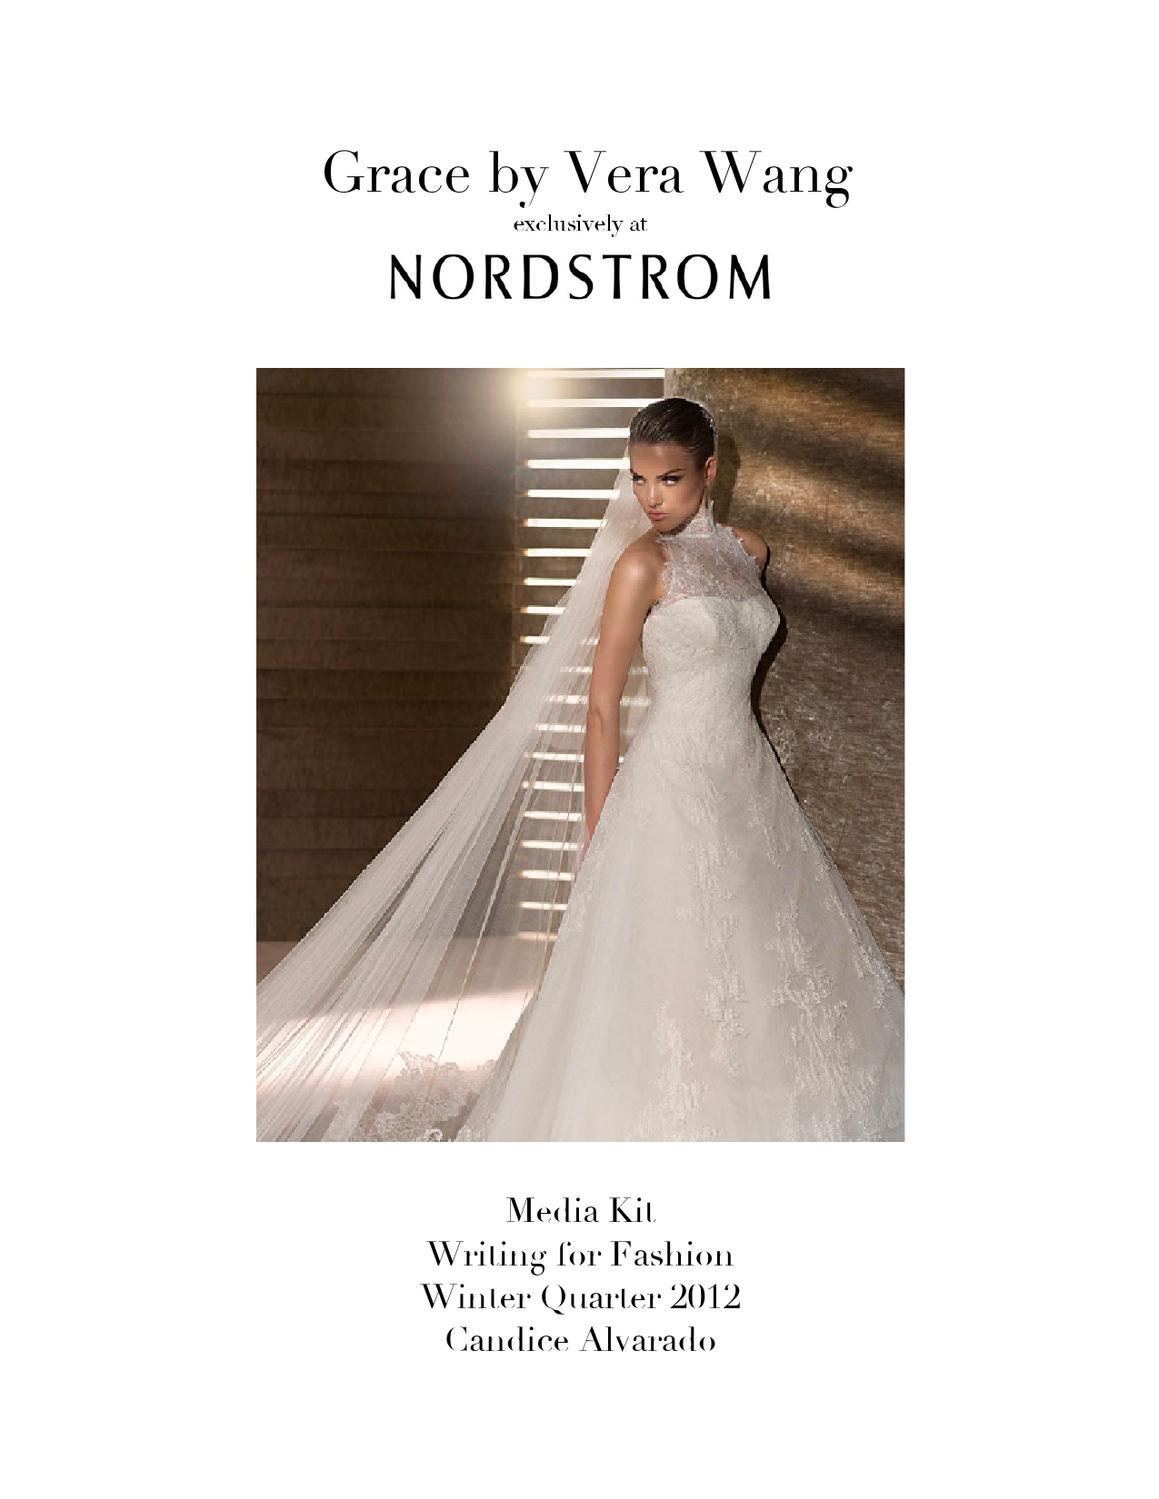 bcdc11b7899b Vera Wang Bridesmaid Dresses Nordstrom - raveitsafe